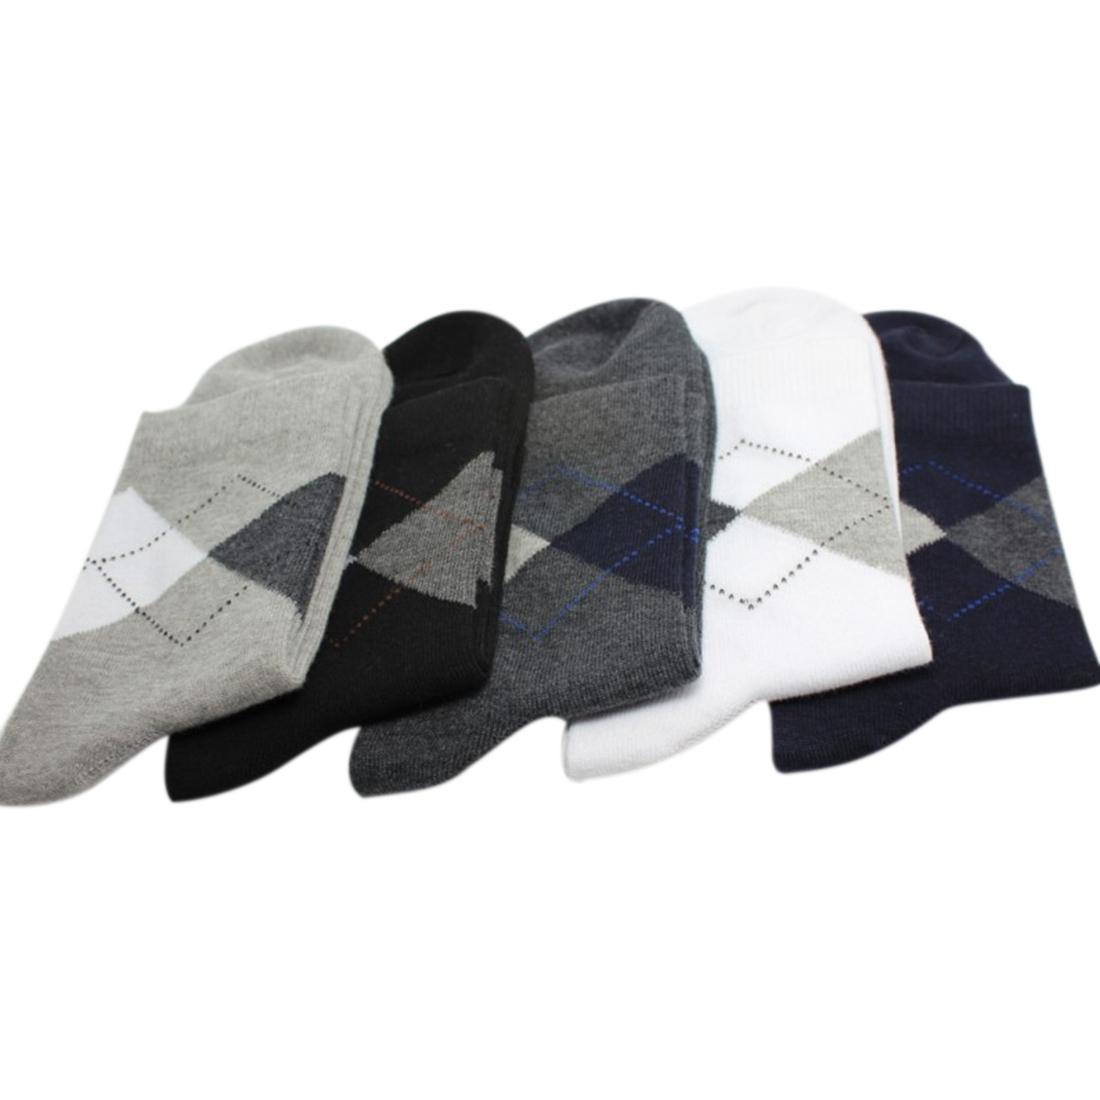 Fashion New 5pairs/lot Men Socks Autumn Winter Warm Breathable Cotton Socks Casual Classic Business Male Socks 5 Colors